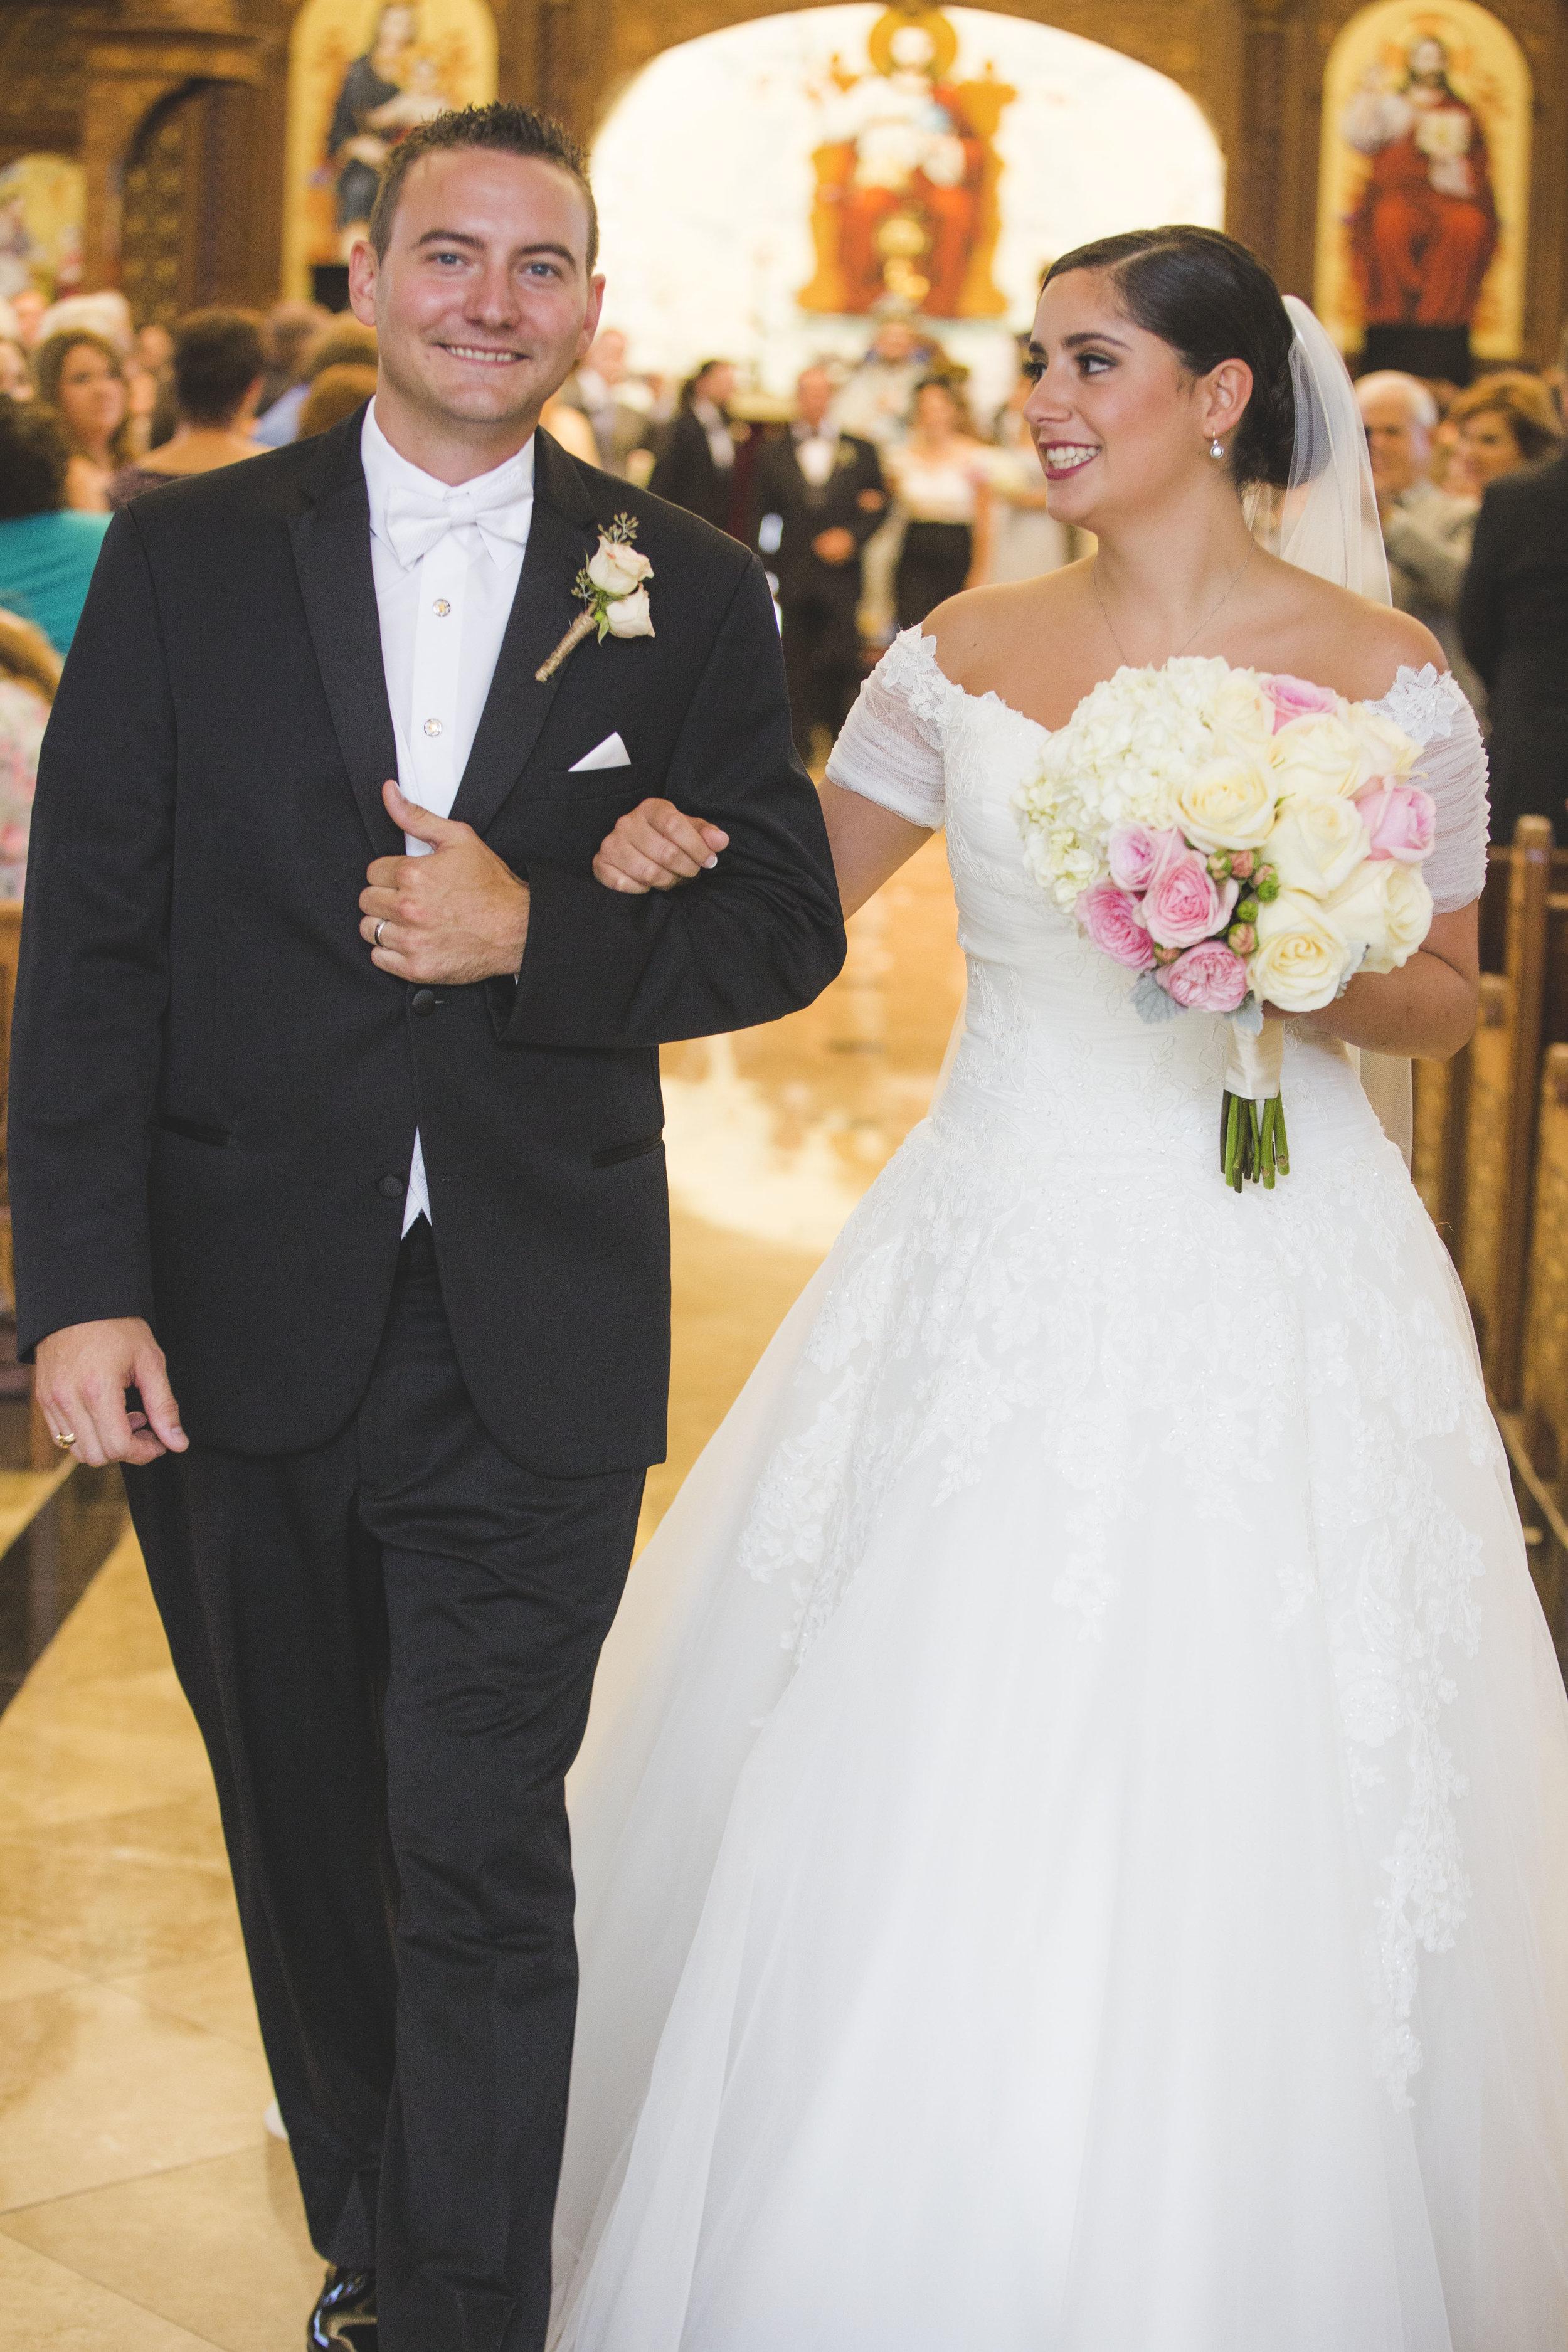 ATGI_Magali & Josh Wedding_2S8A0782.jpg